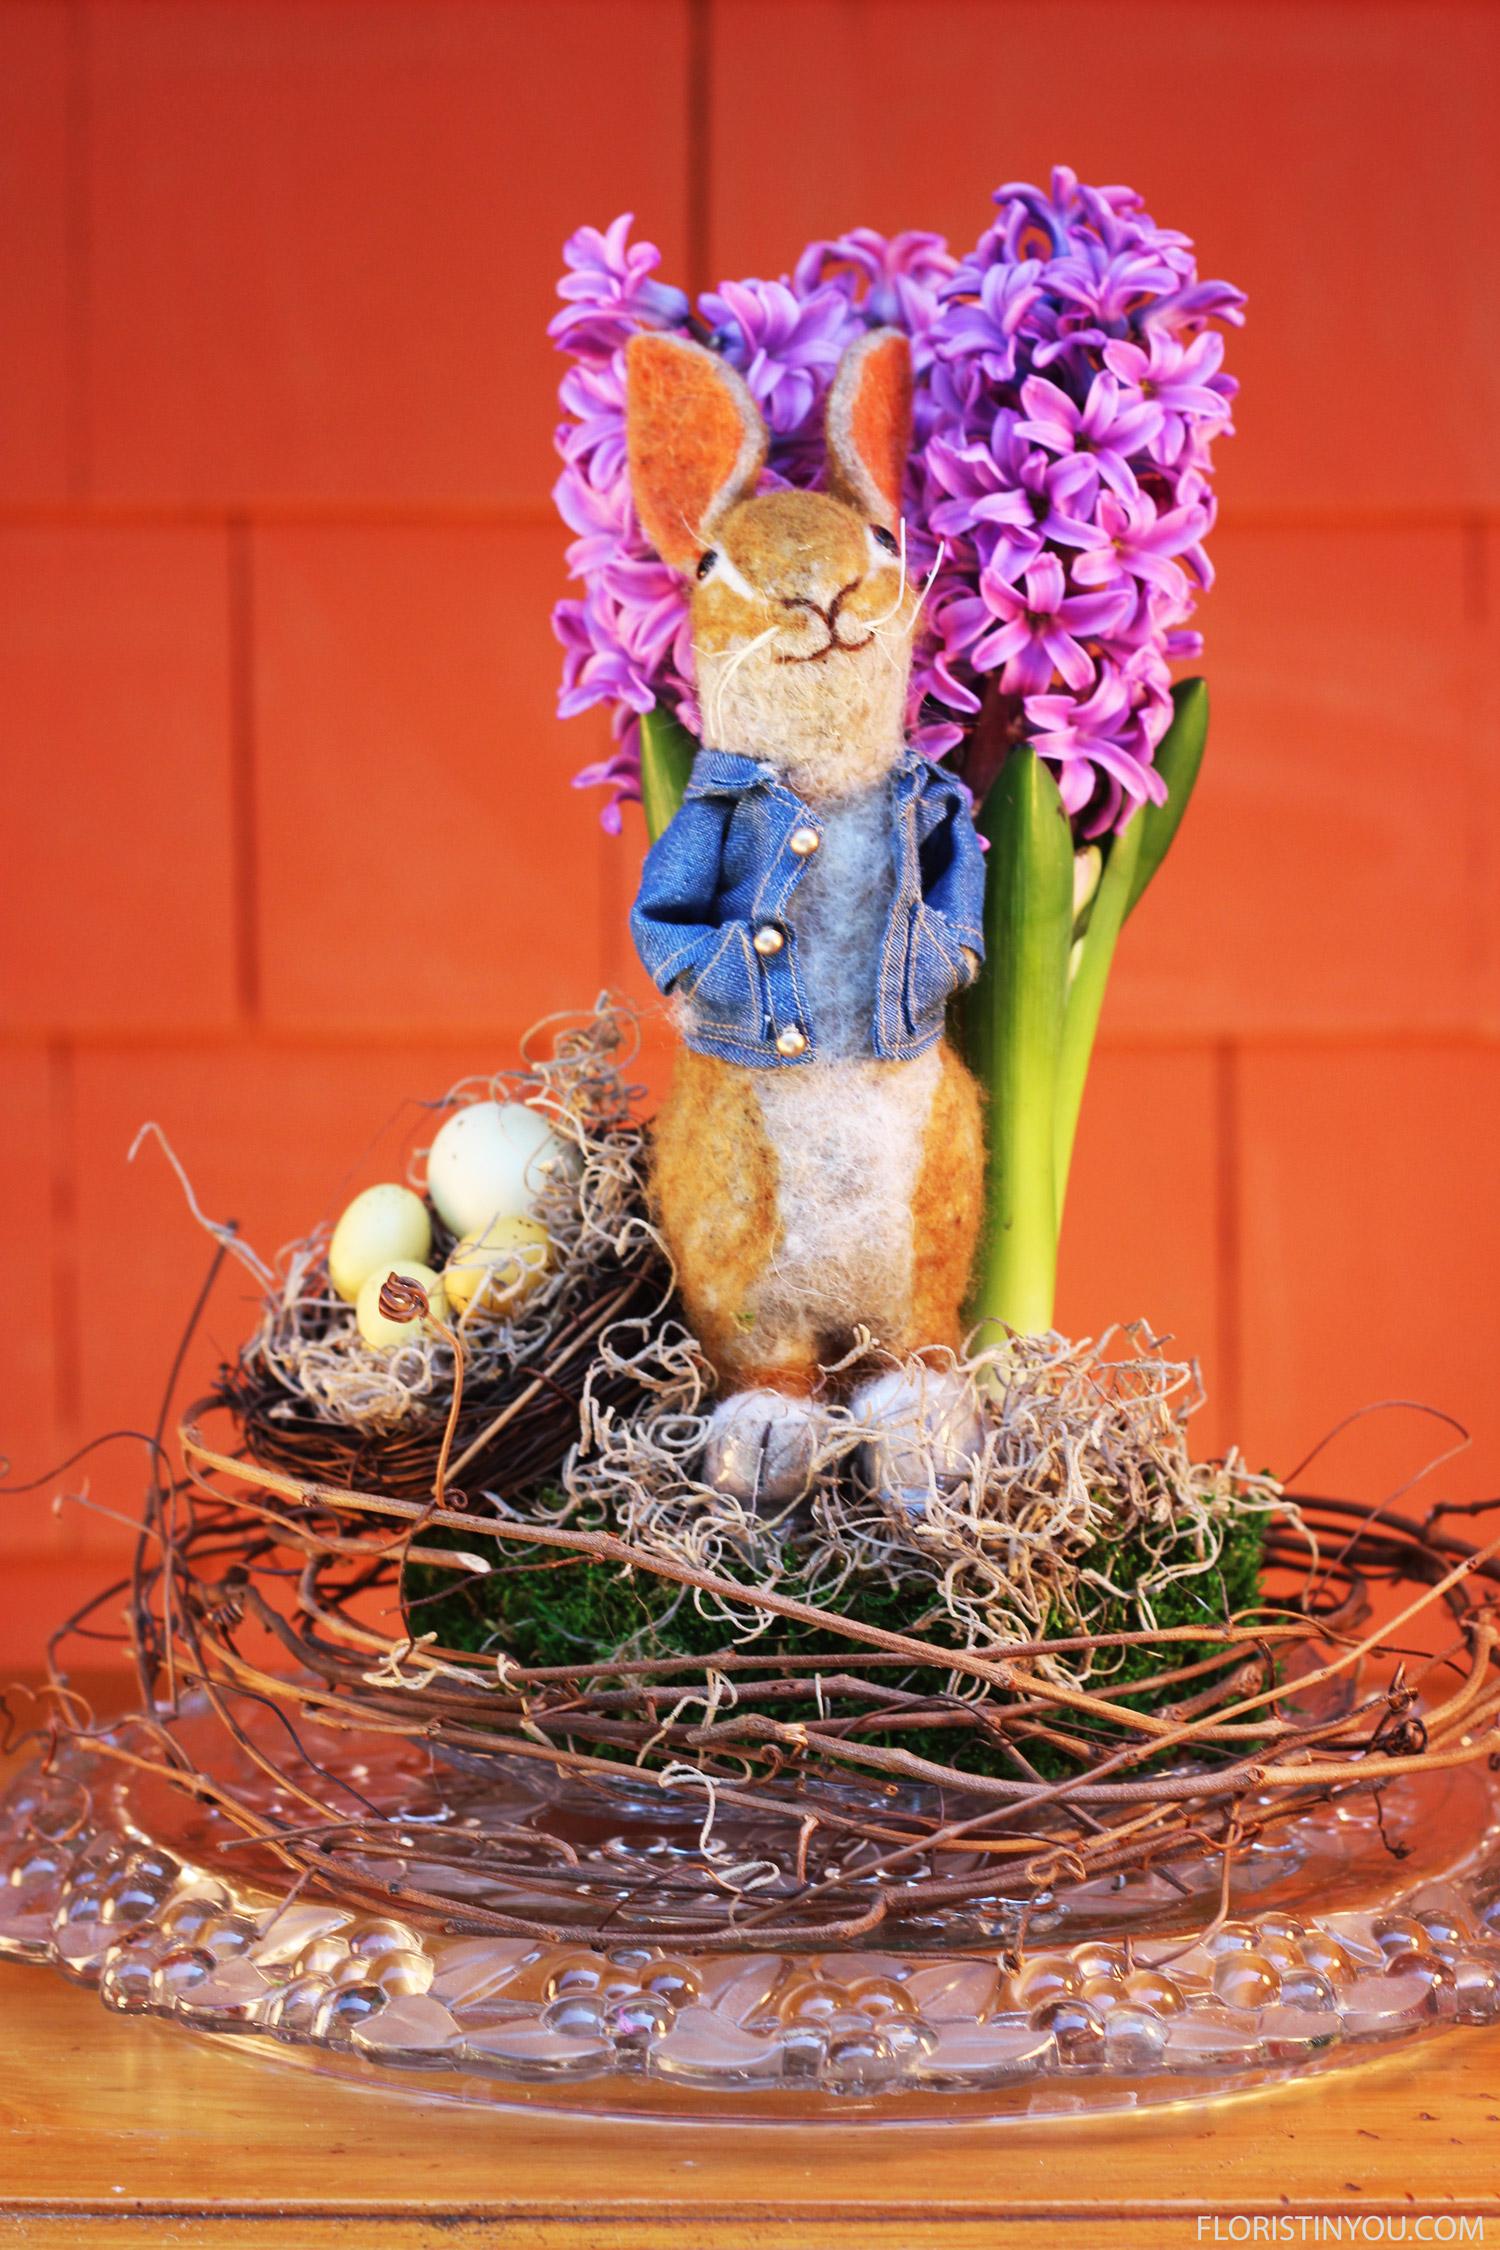 Add grapevine, nest,rabbit. Add Spanish Moss around rabbit's feet.